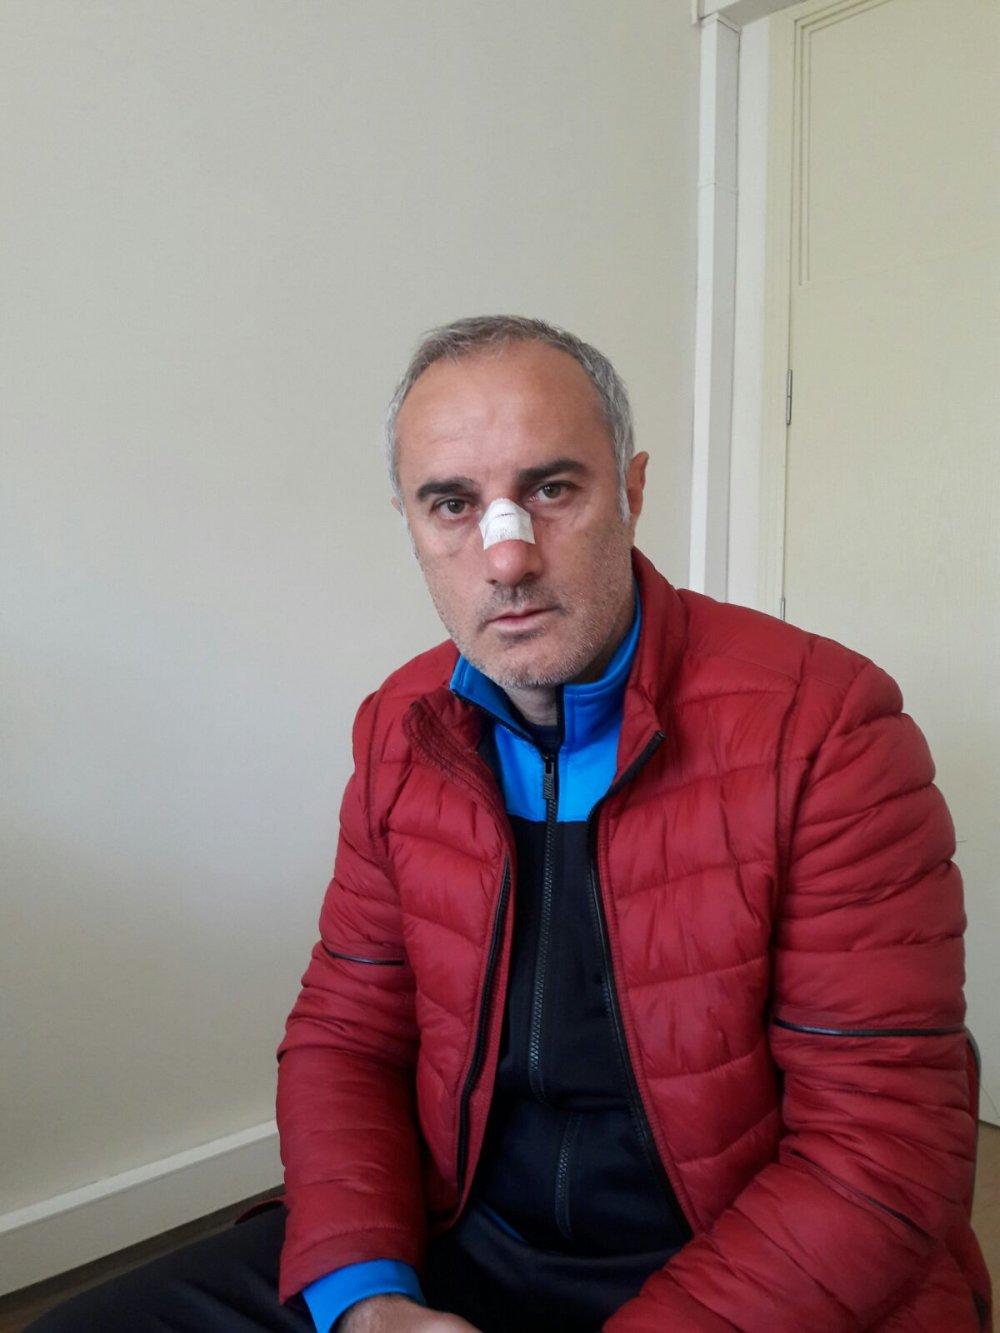 Trabzon'dan öğrenci öğretmeni dövdü!